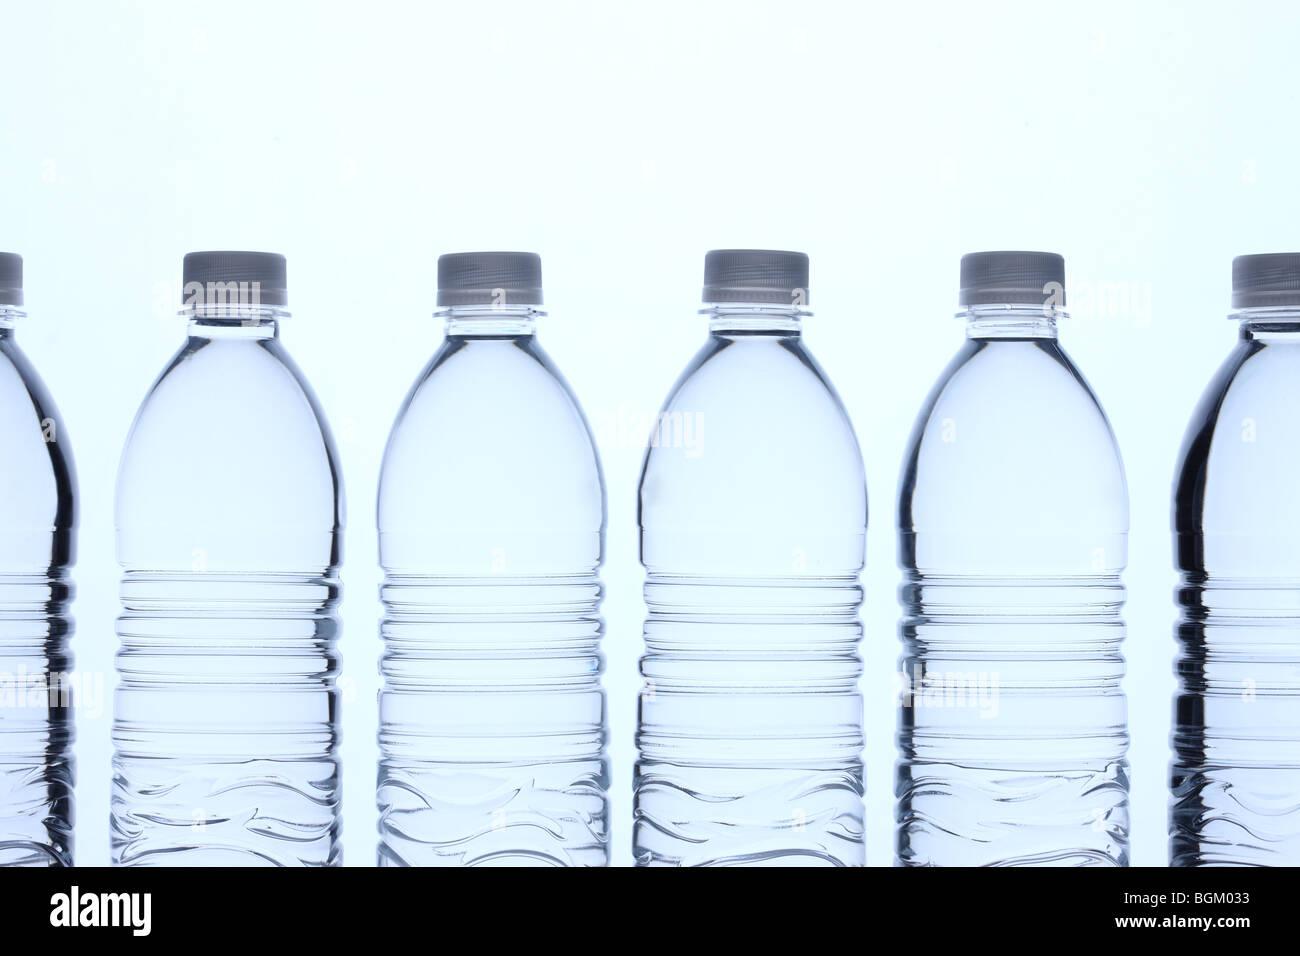 Botellas de agua en la fila Imagen De Stock